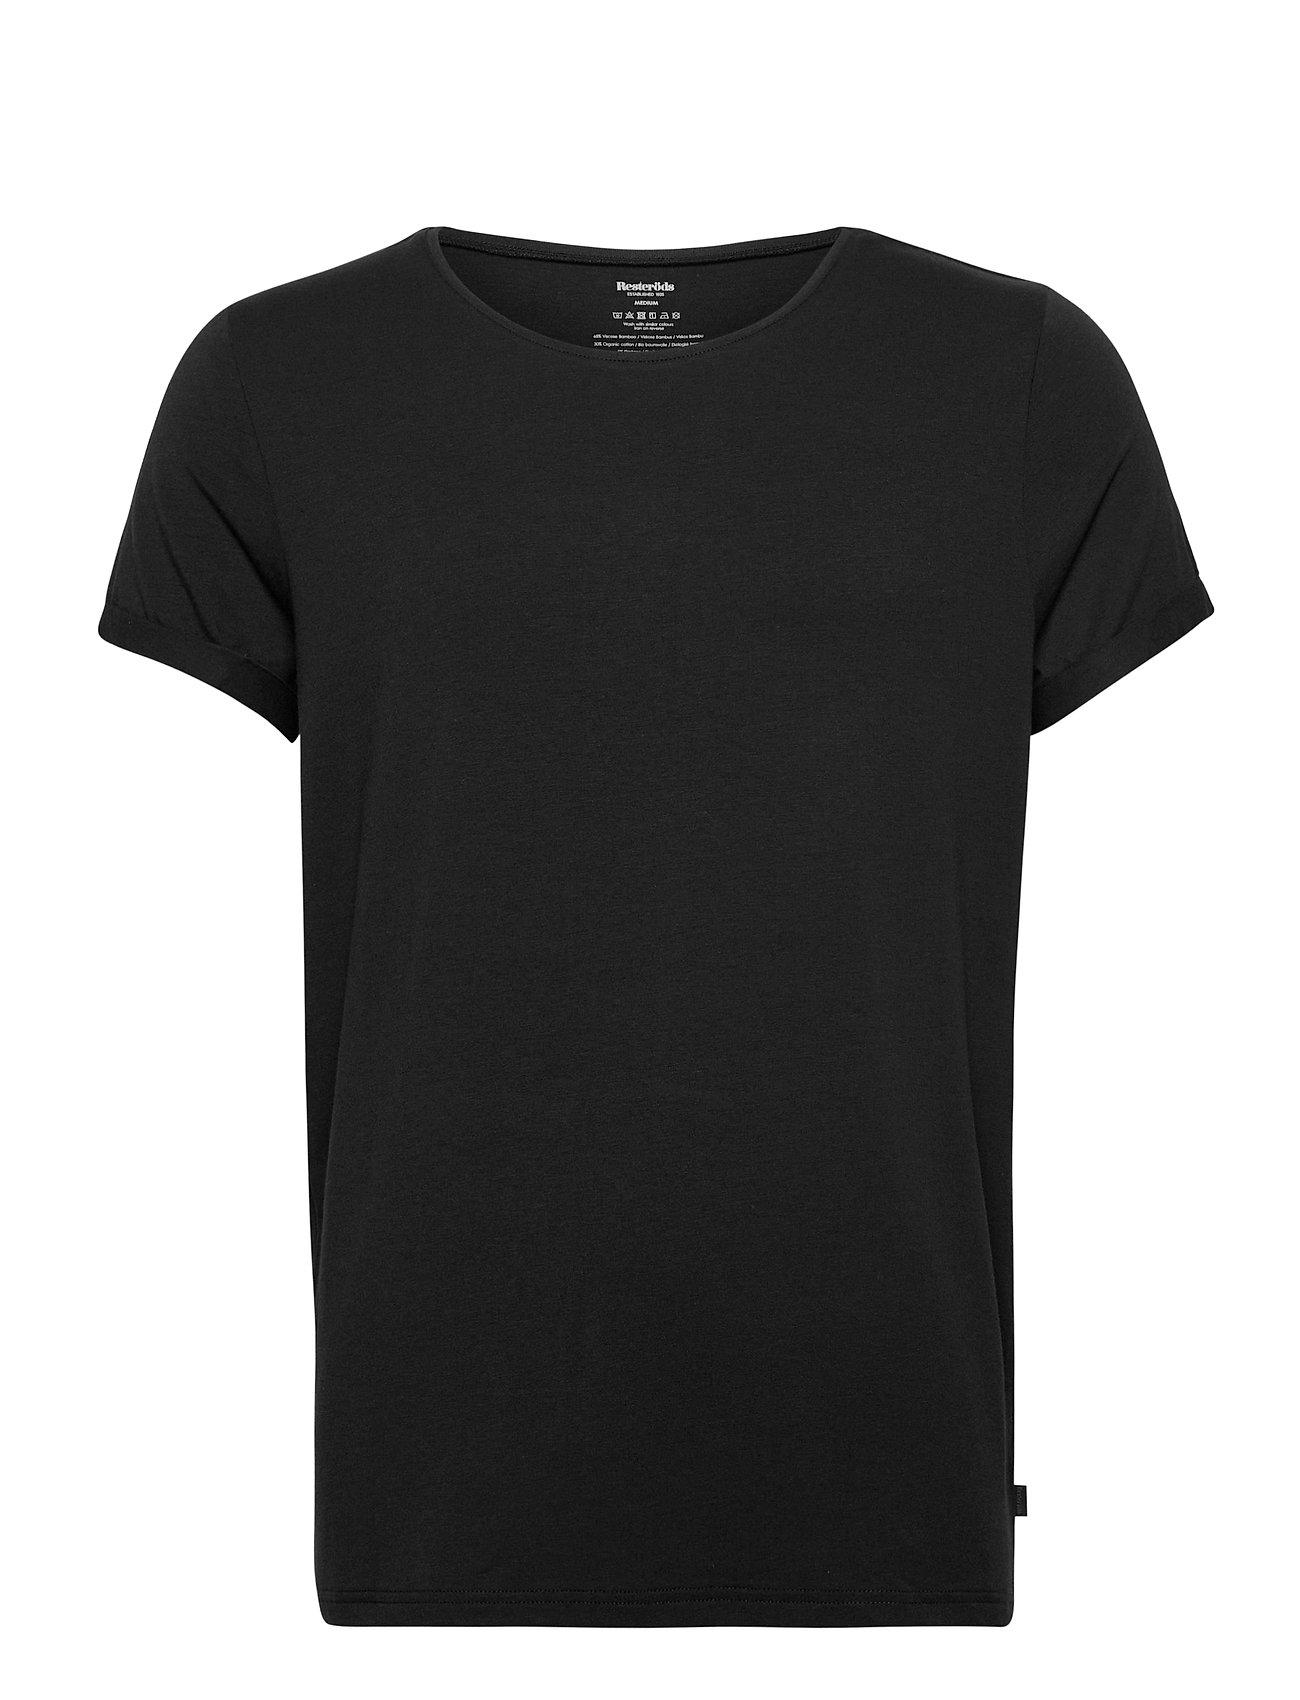 Image of Bamboo Jimmy Tee T-shirt Sort Resteröds (3455507613)